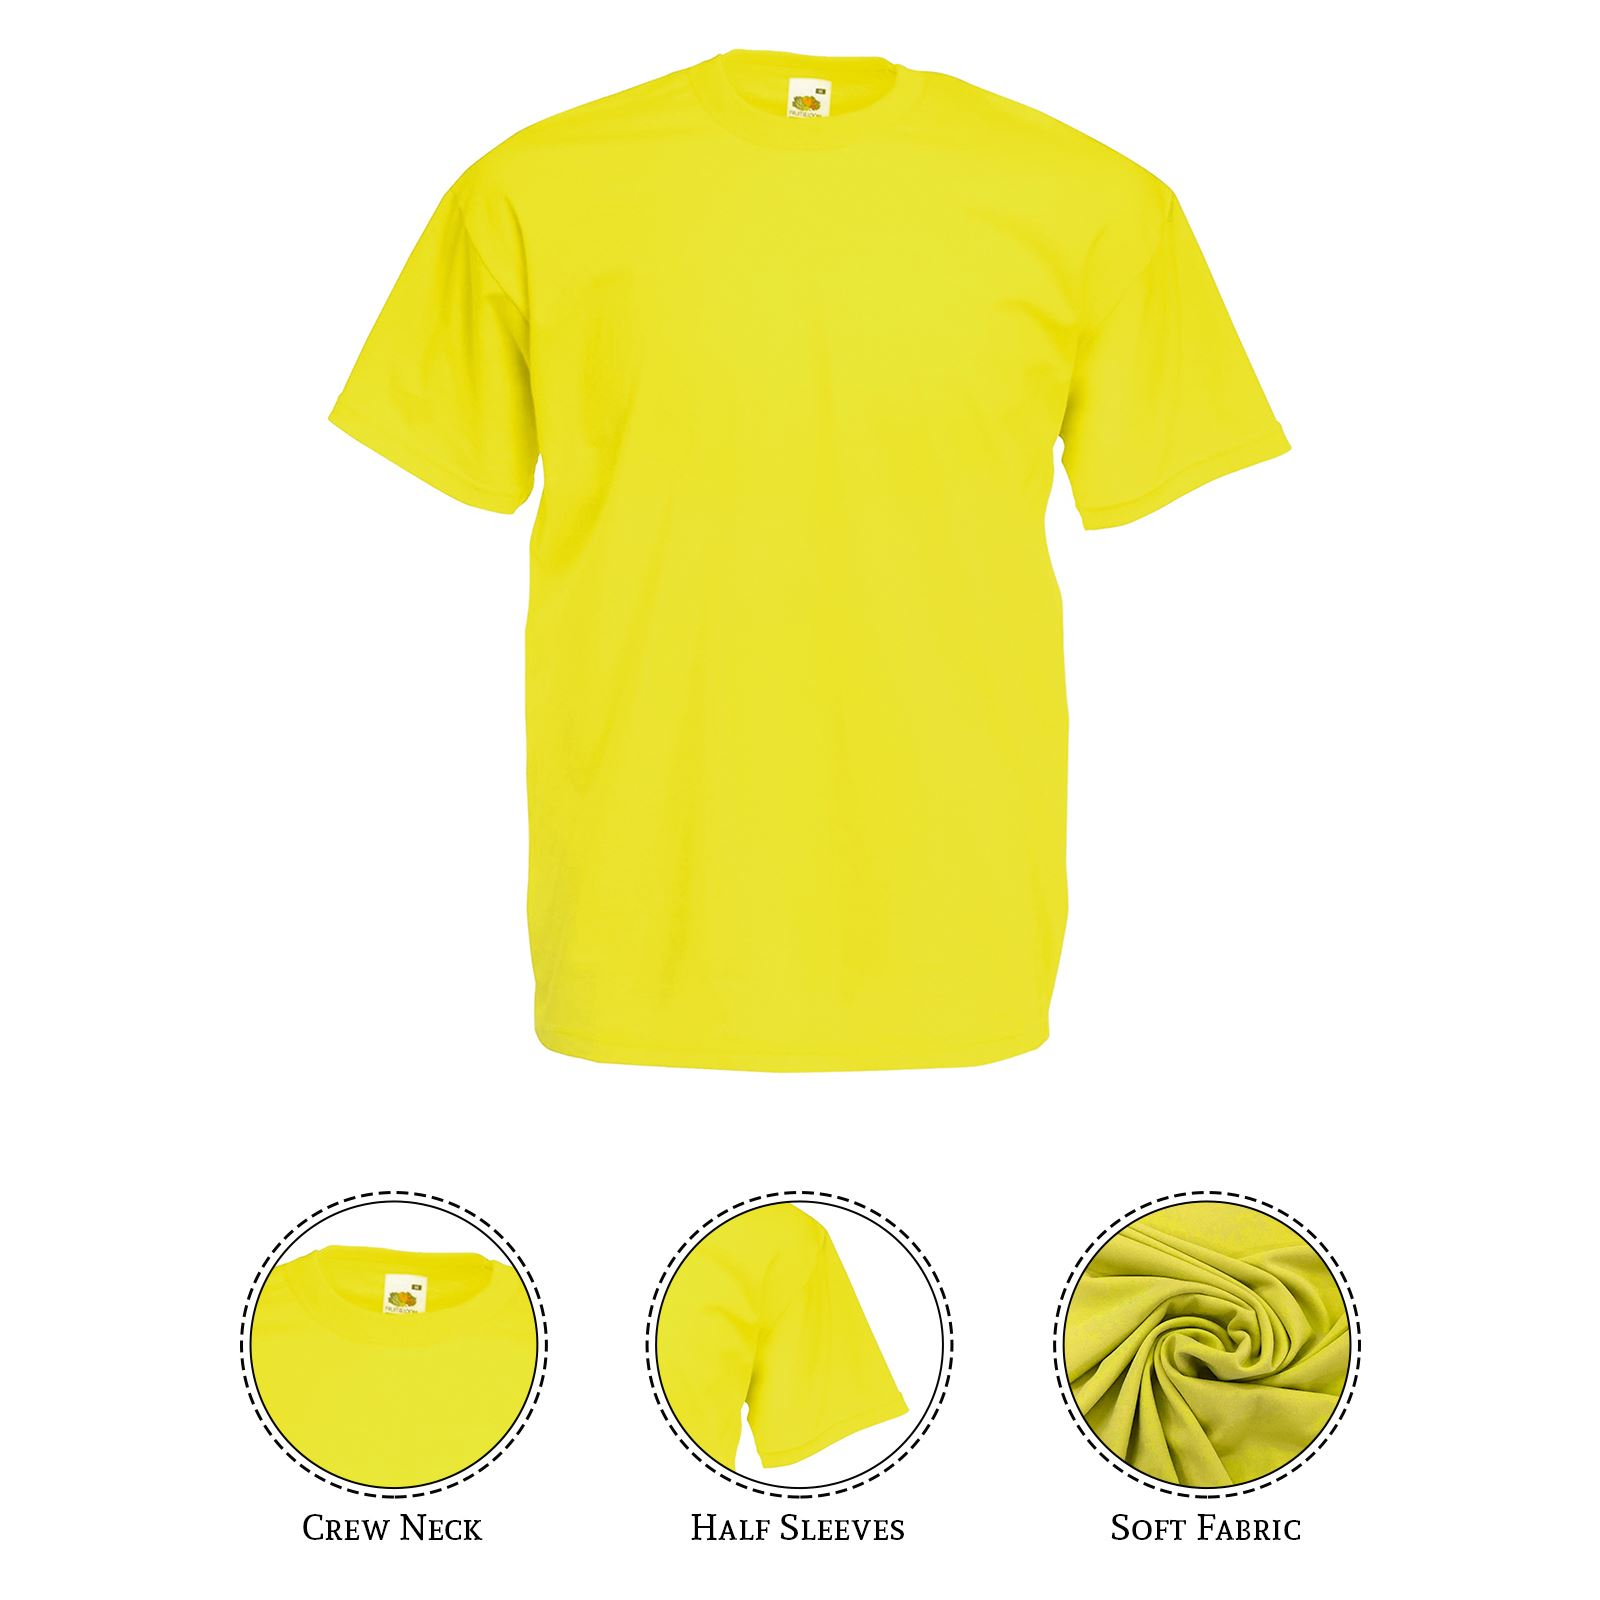 thumbnail 29 - Men-s-Fruit-Of-The-Loom-T-Shirt-Original-100-Cotton-Casual-Plain-Top-Tee